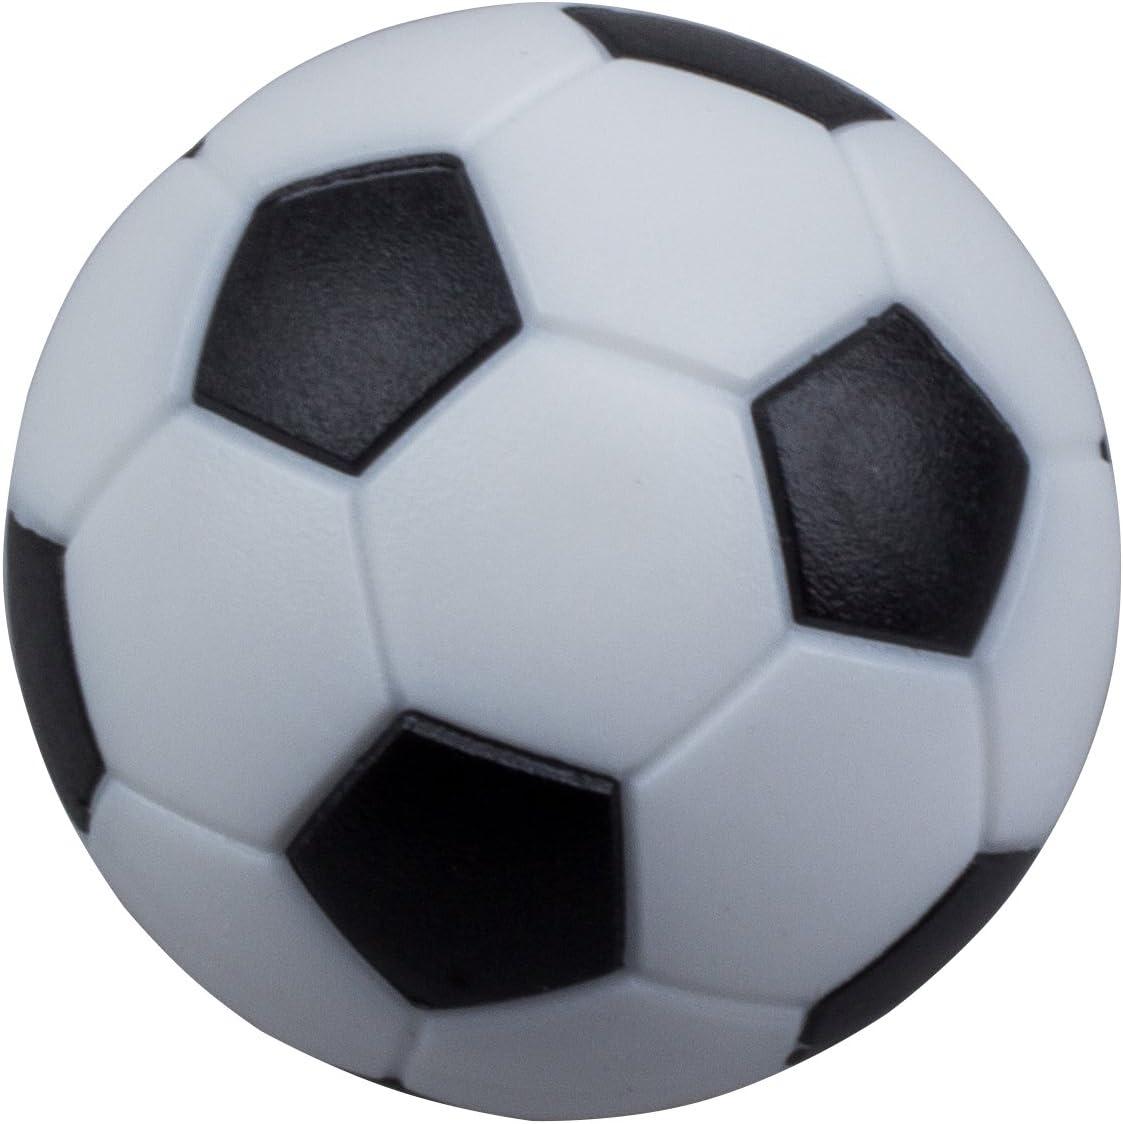 TOOGOO 4pcs de 32mm Mesa de Futbol de plastico Pelota de Foosball Bola de futbolin: Amazon.es: Juguetes y juegos